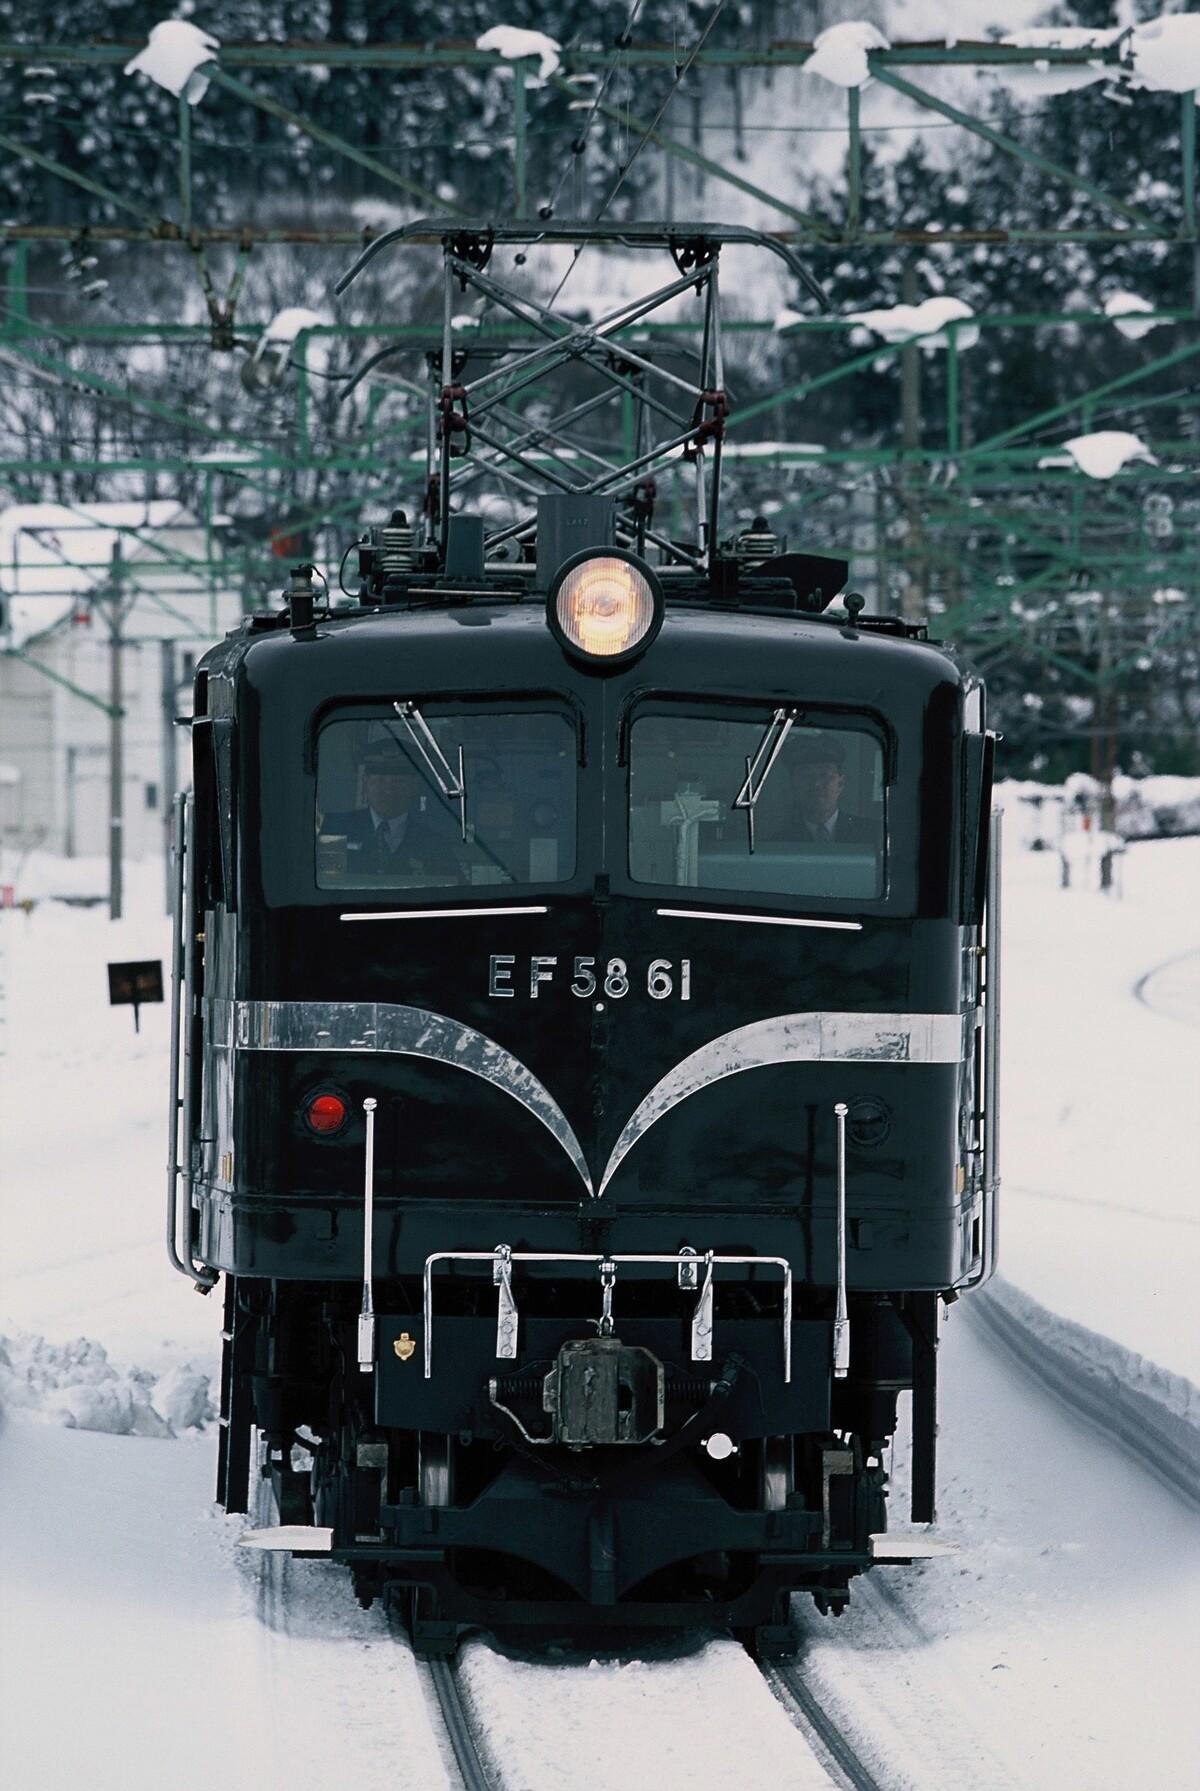 043-025